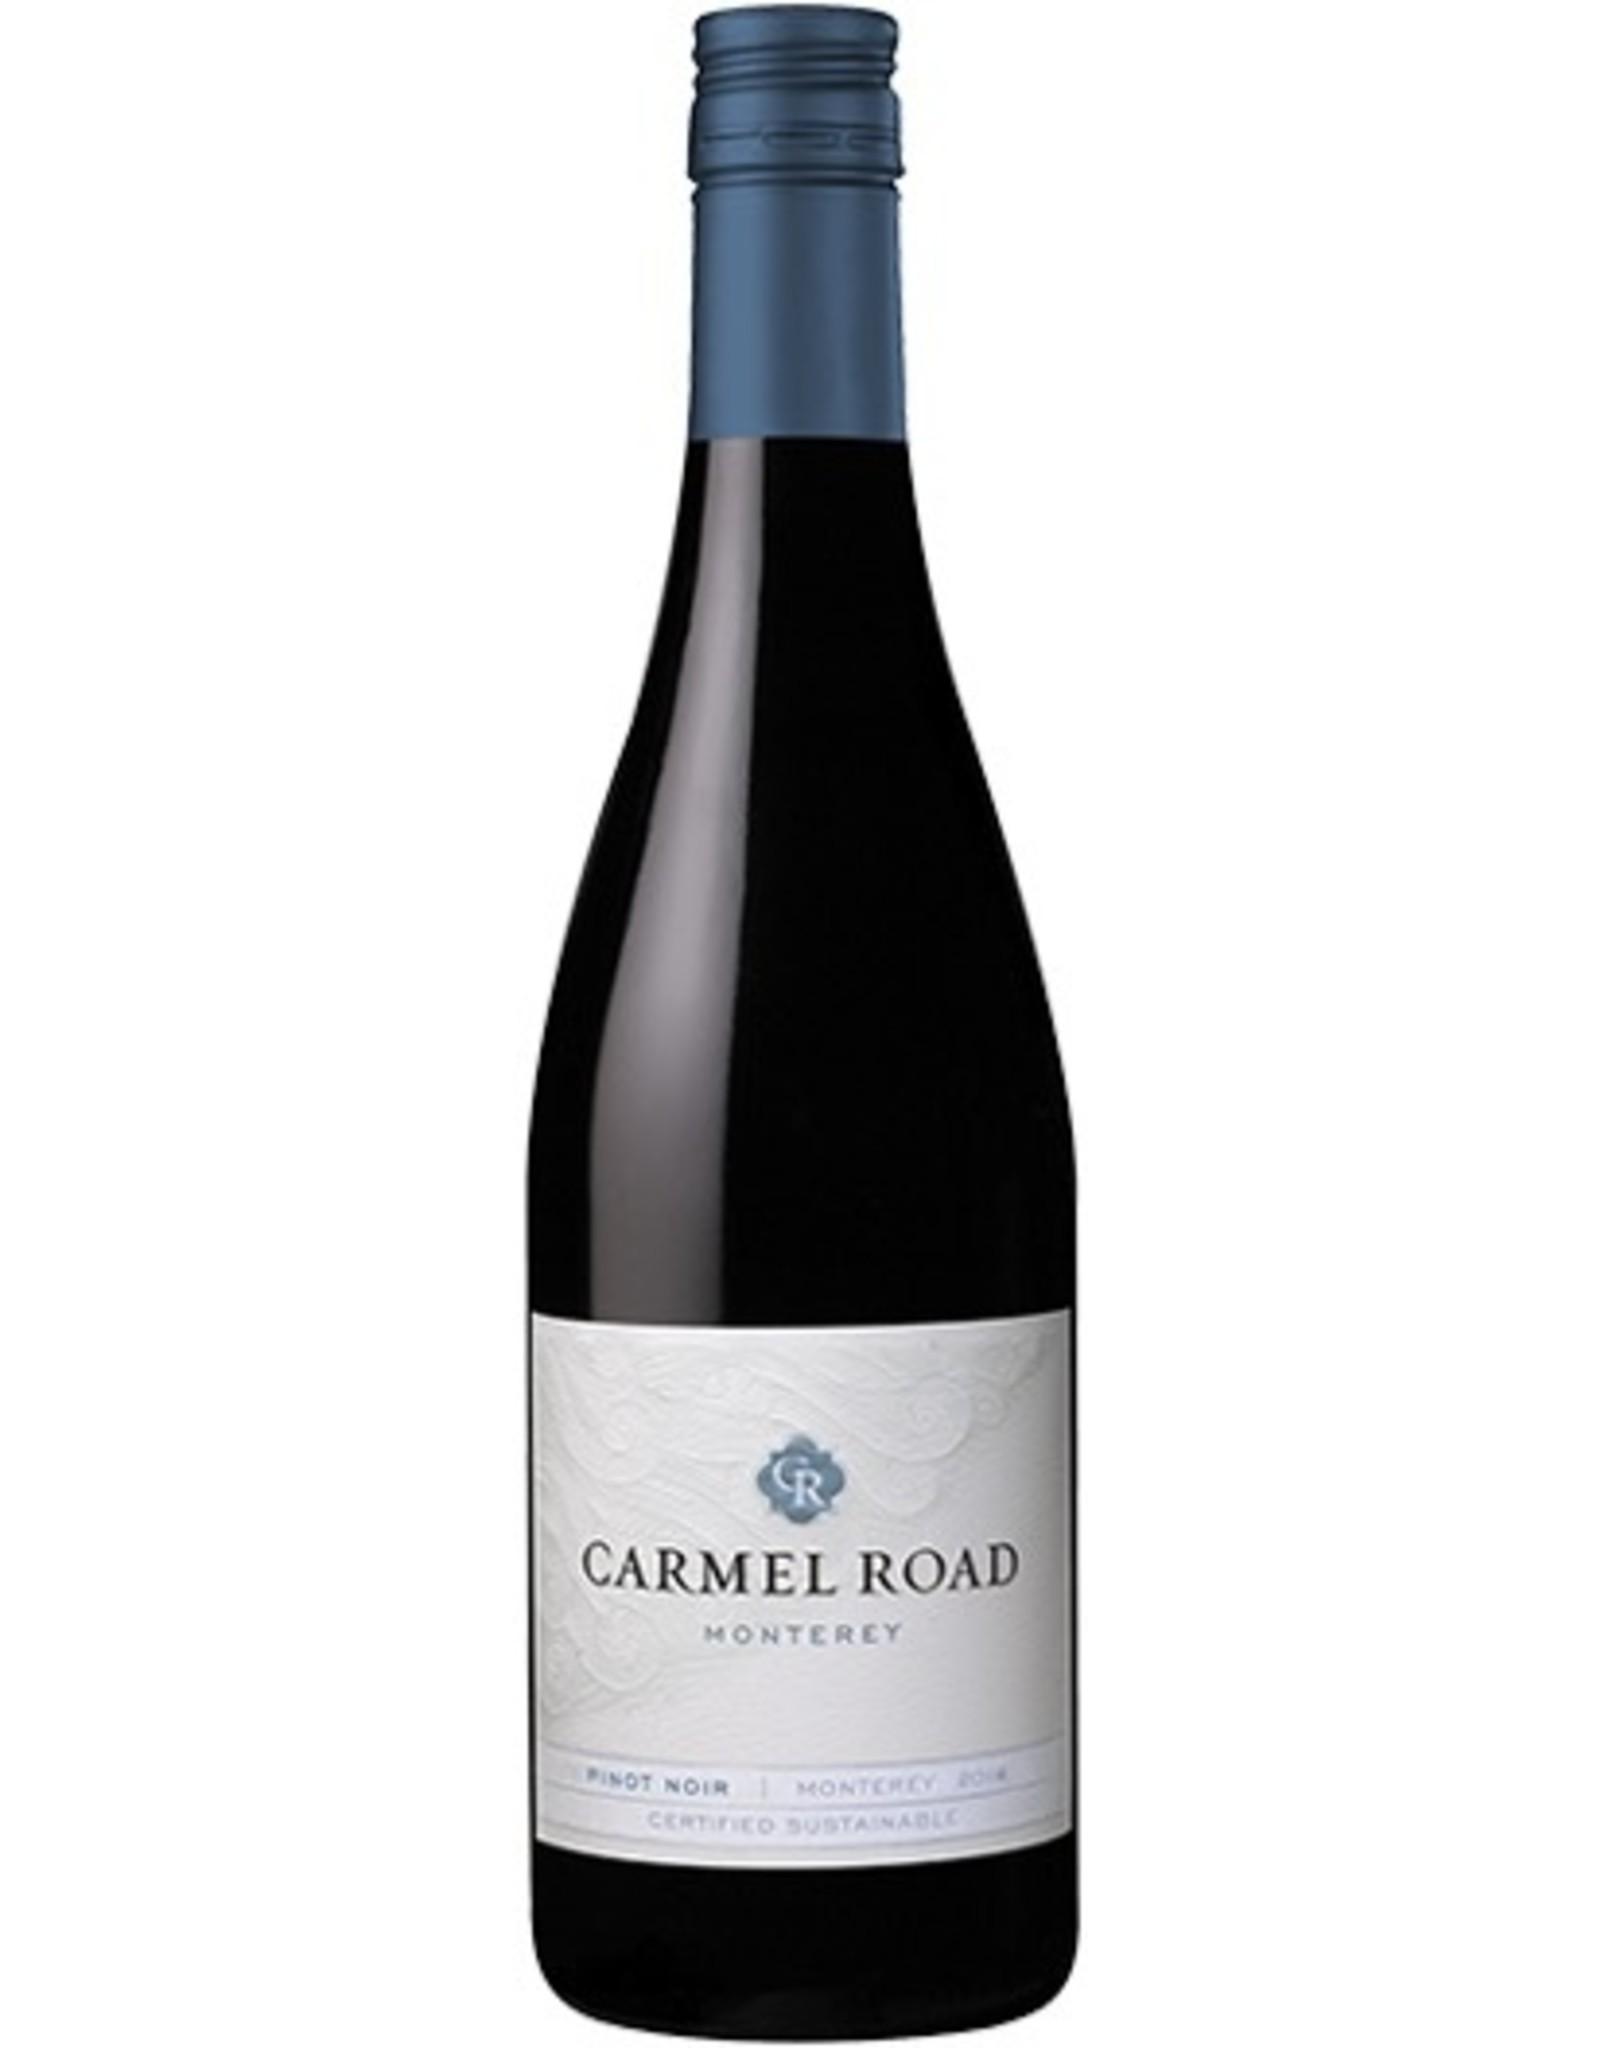 Red Wine 2015, Carmel Road, Pinot Noir, Monterey County, Central Coast, California, 4.5% Alc, CT90